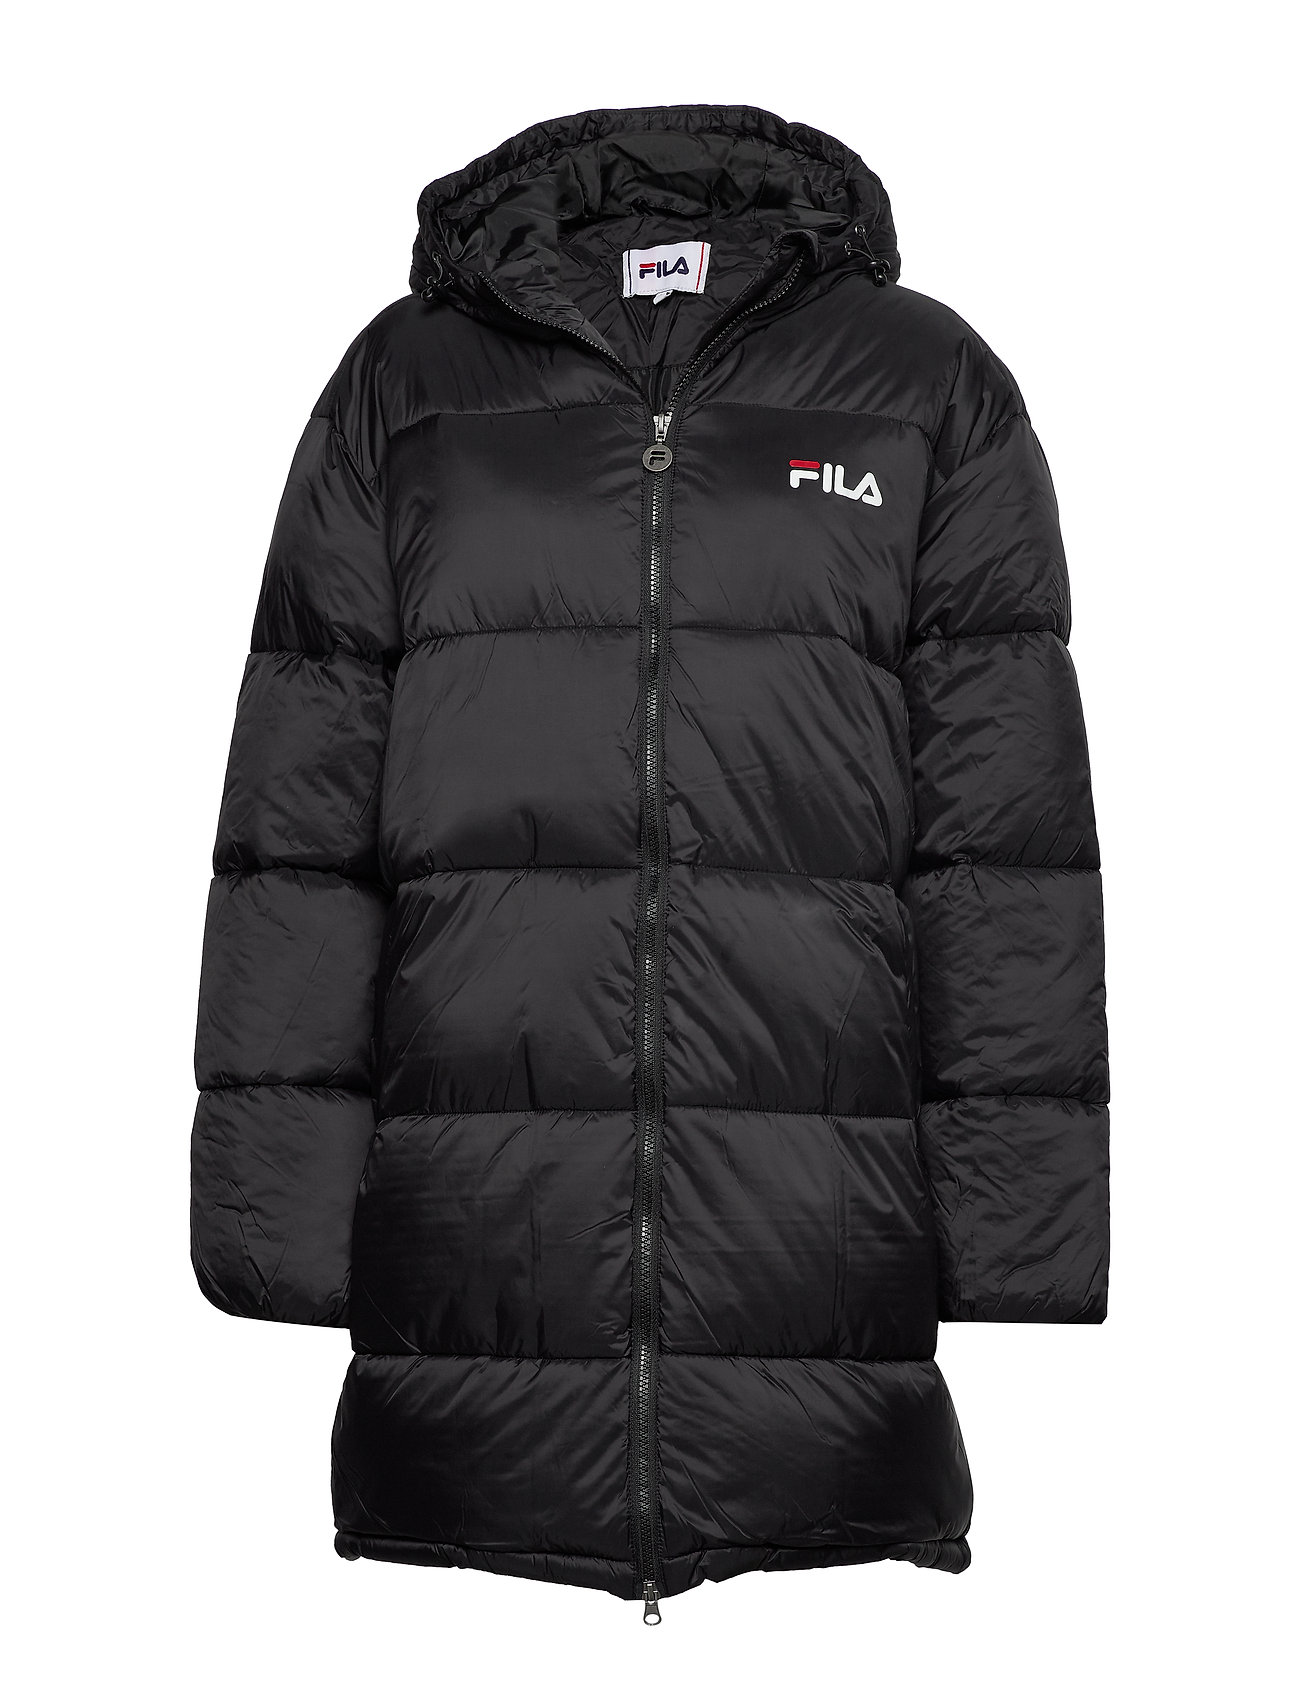 Image of Women Bronwen Puff Hood Jacket Foret Jakke Sort FILA (3457714783)